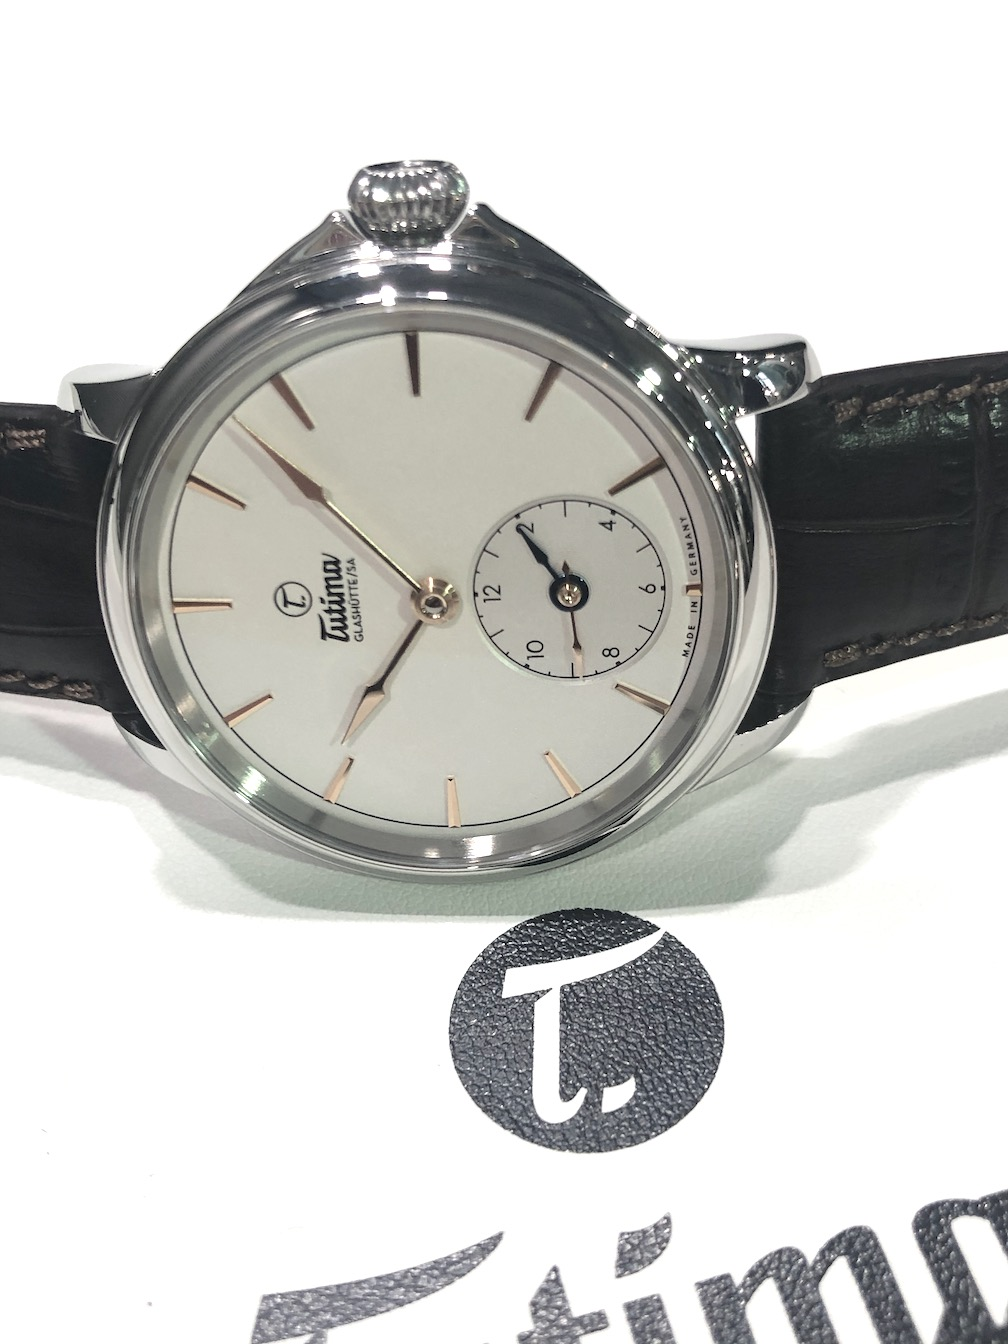 Tutima Patria Dual Time watch